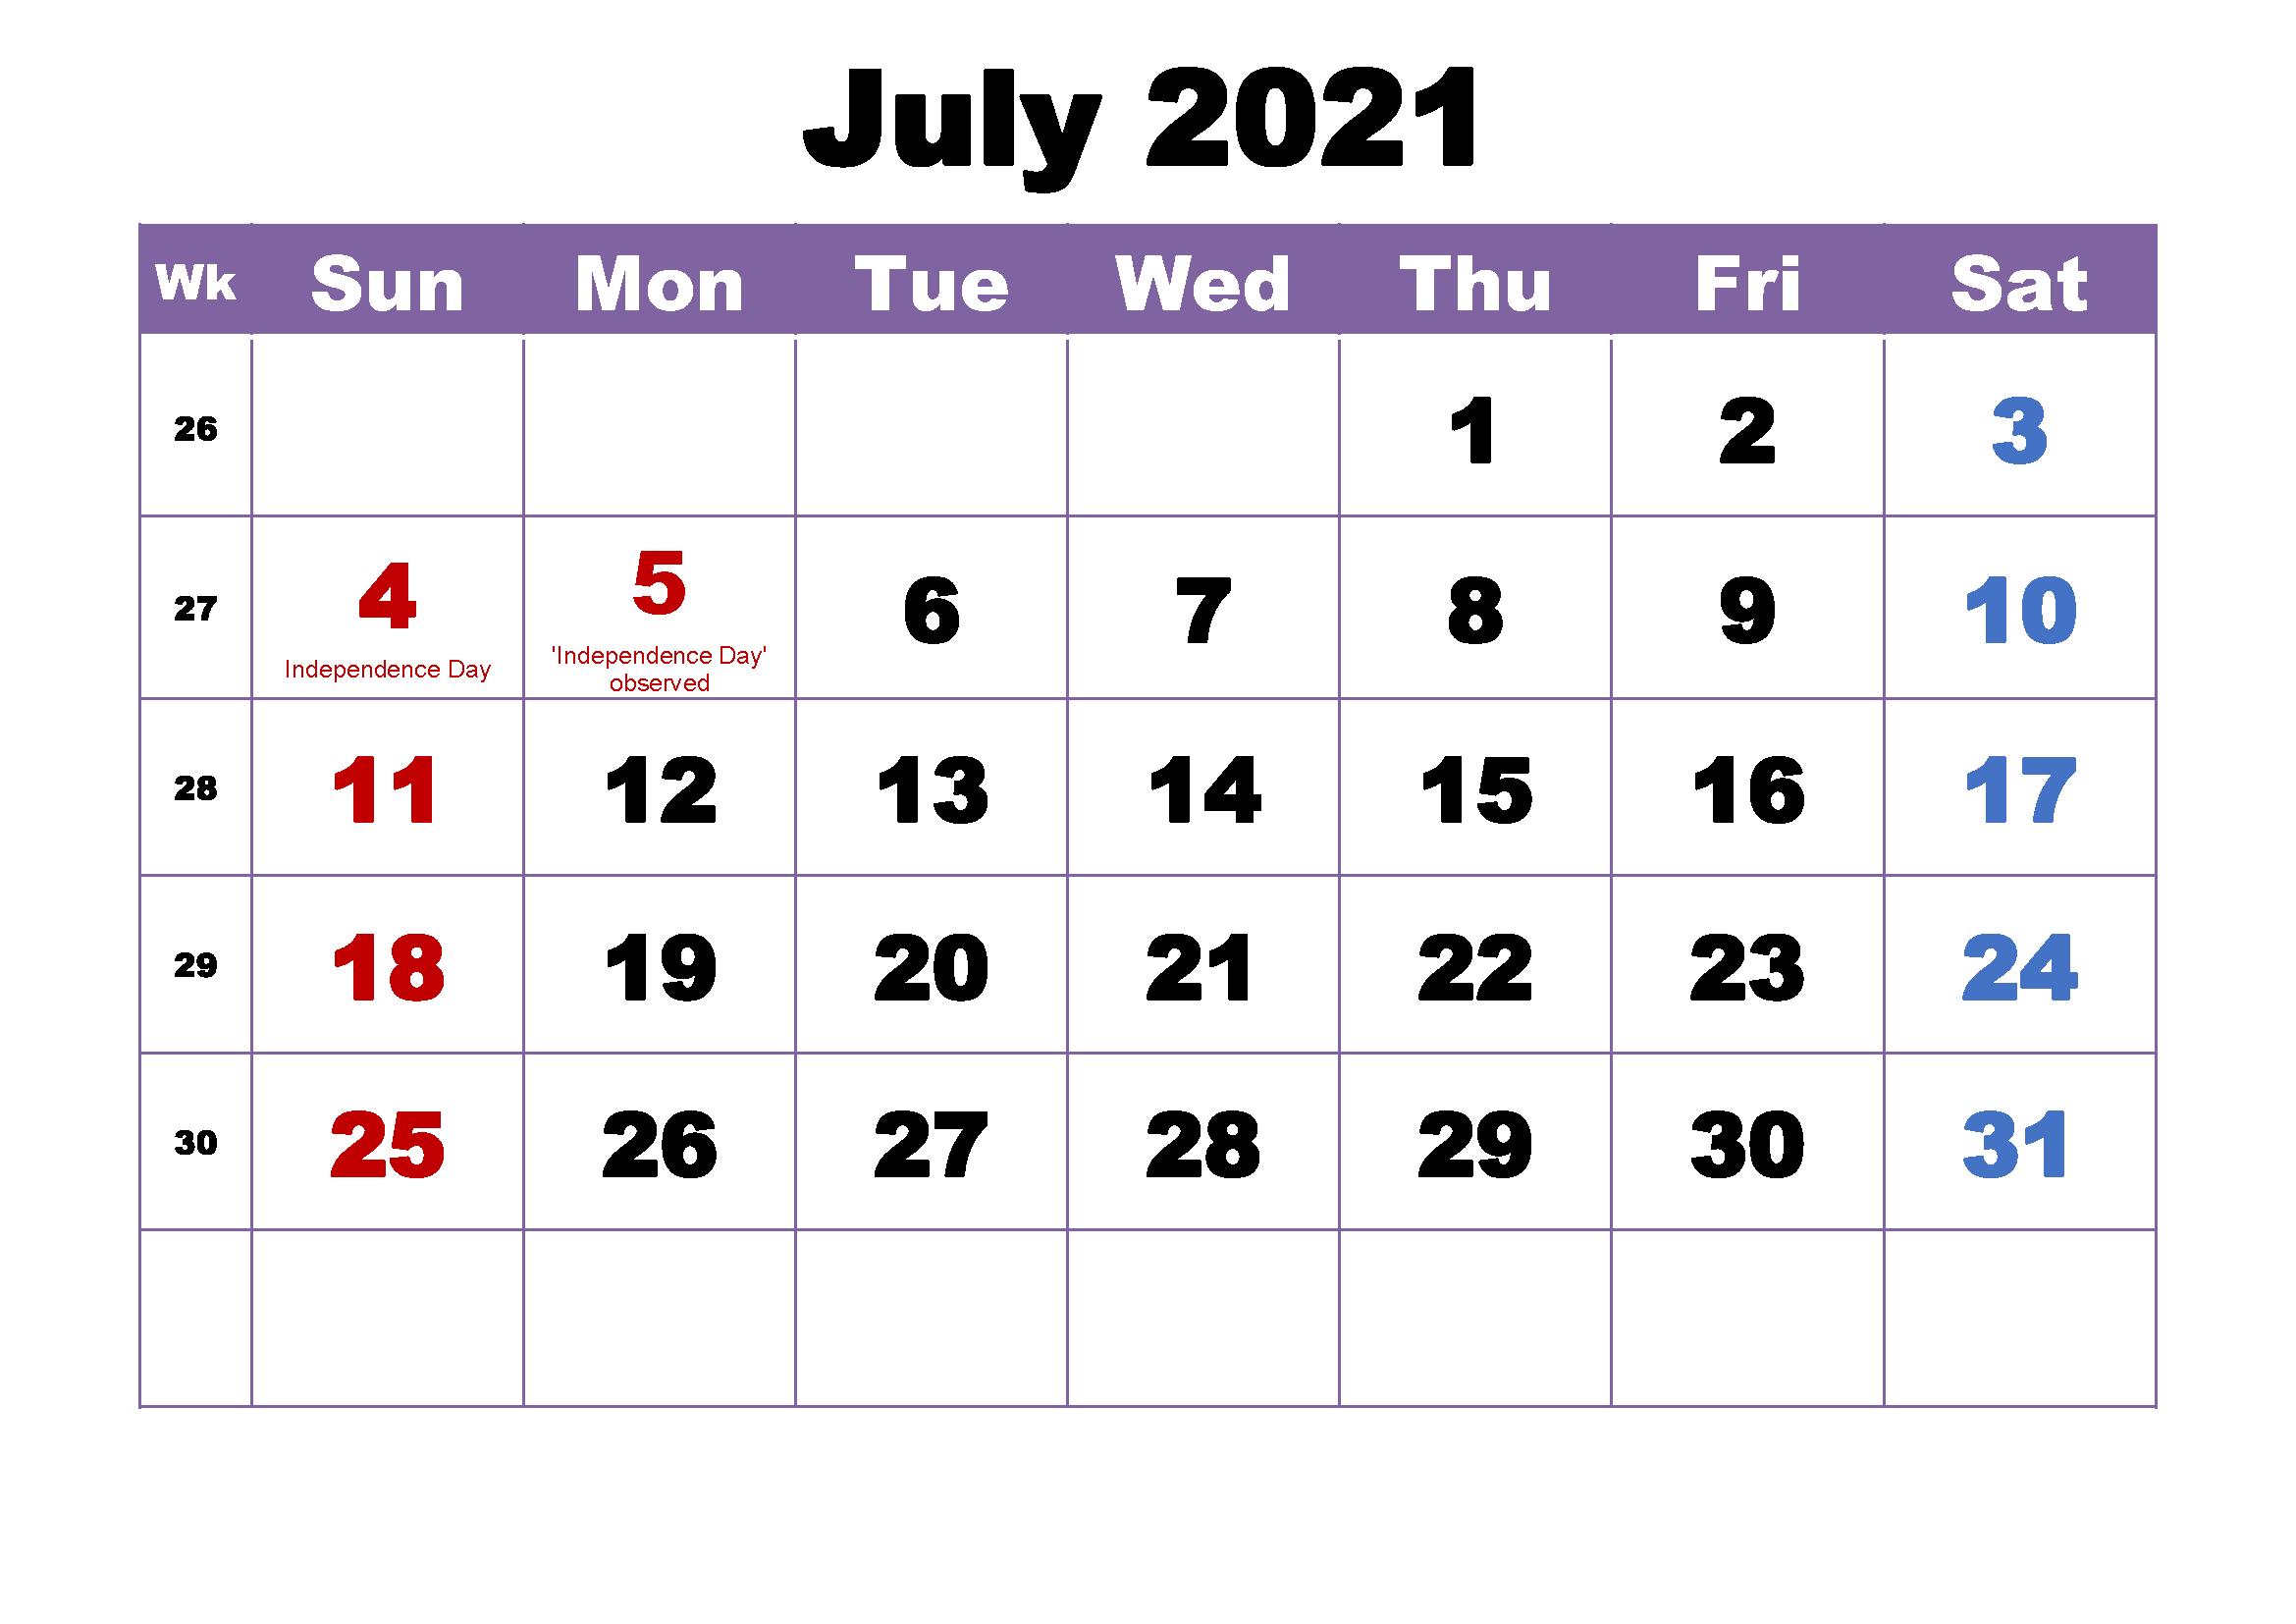 July Holidays 2021 Calendar